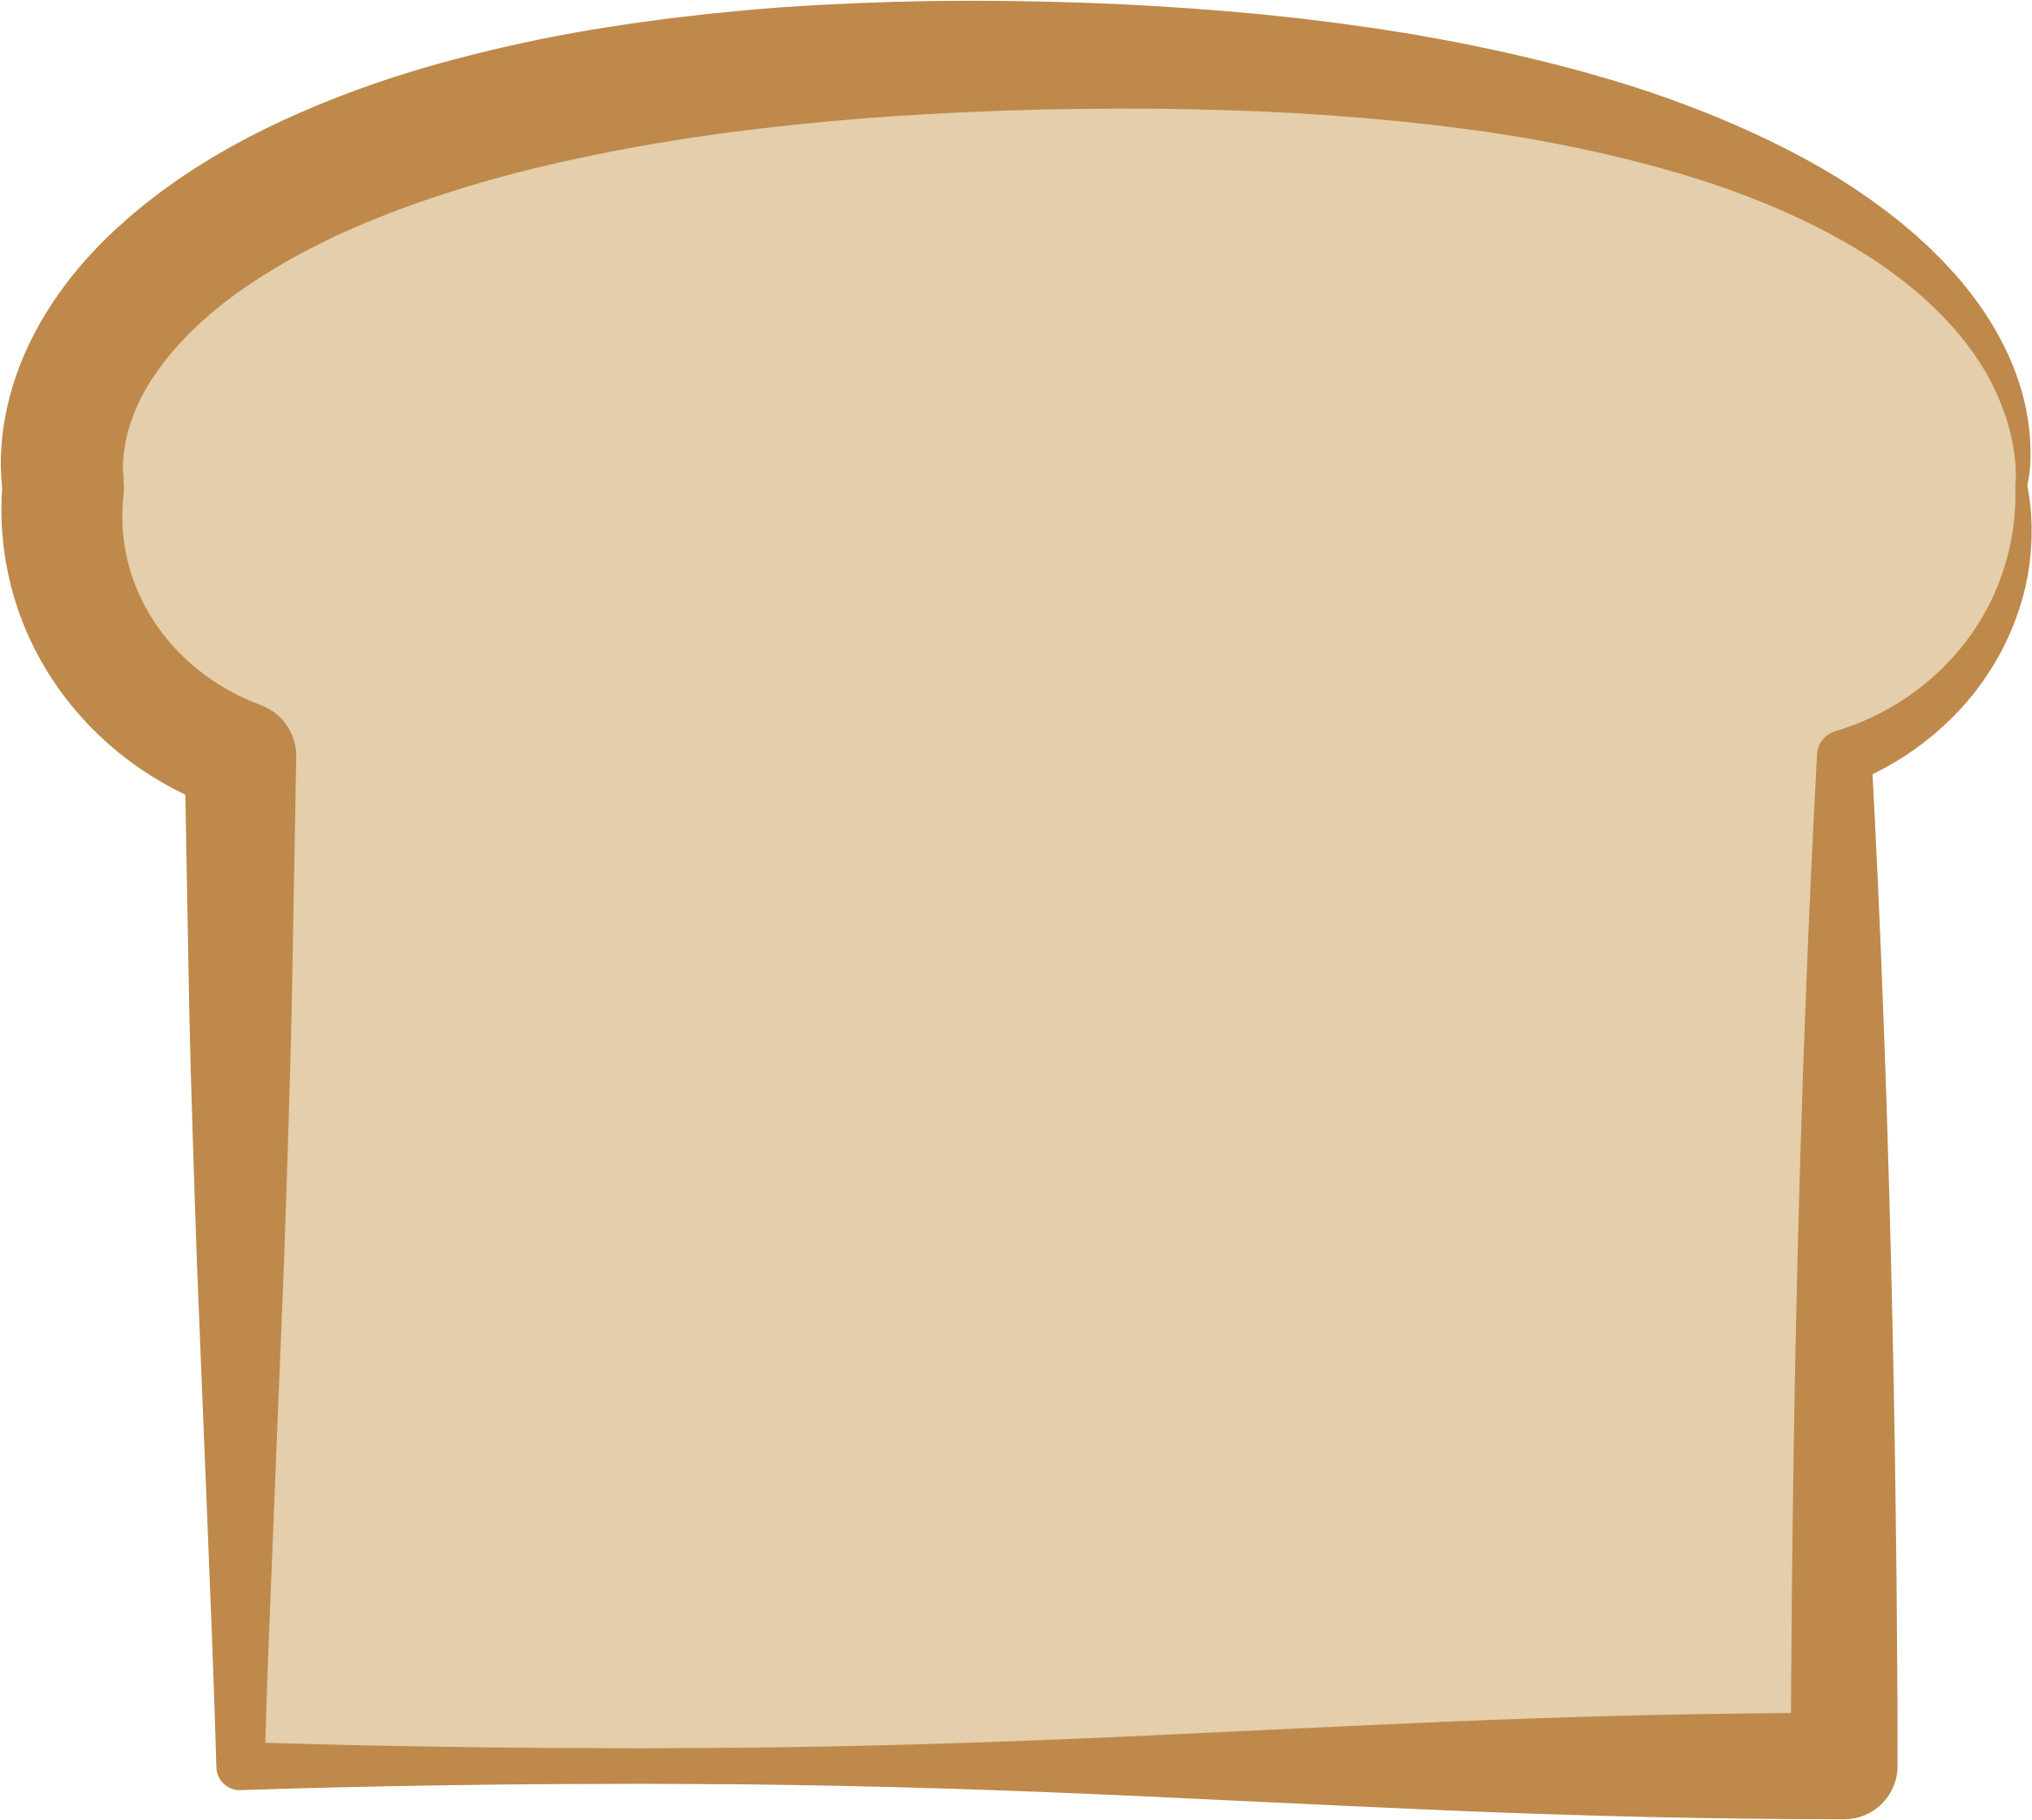 toast clipart slice bread - bread slice clip art - (2333x2090) png clipart  download  clipartmax